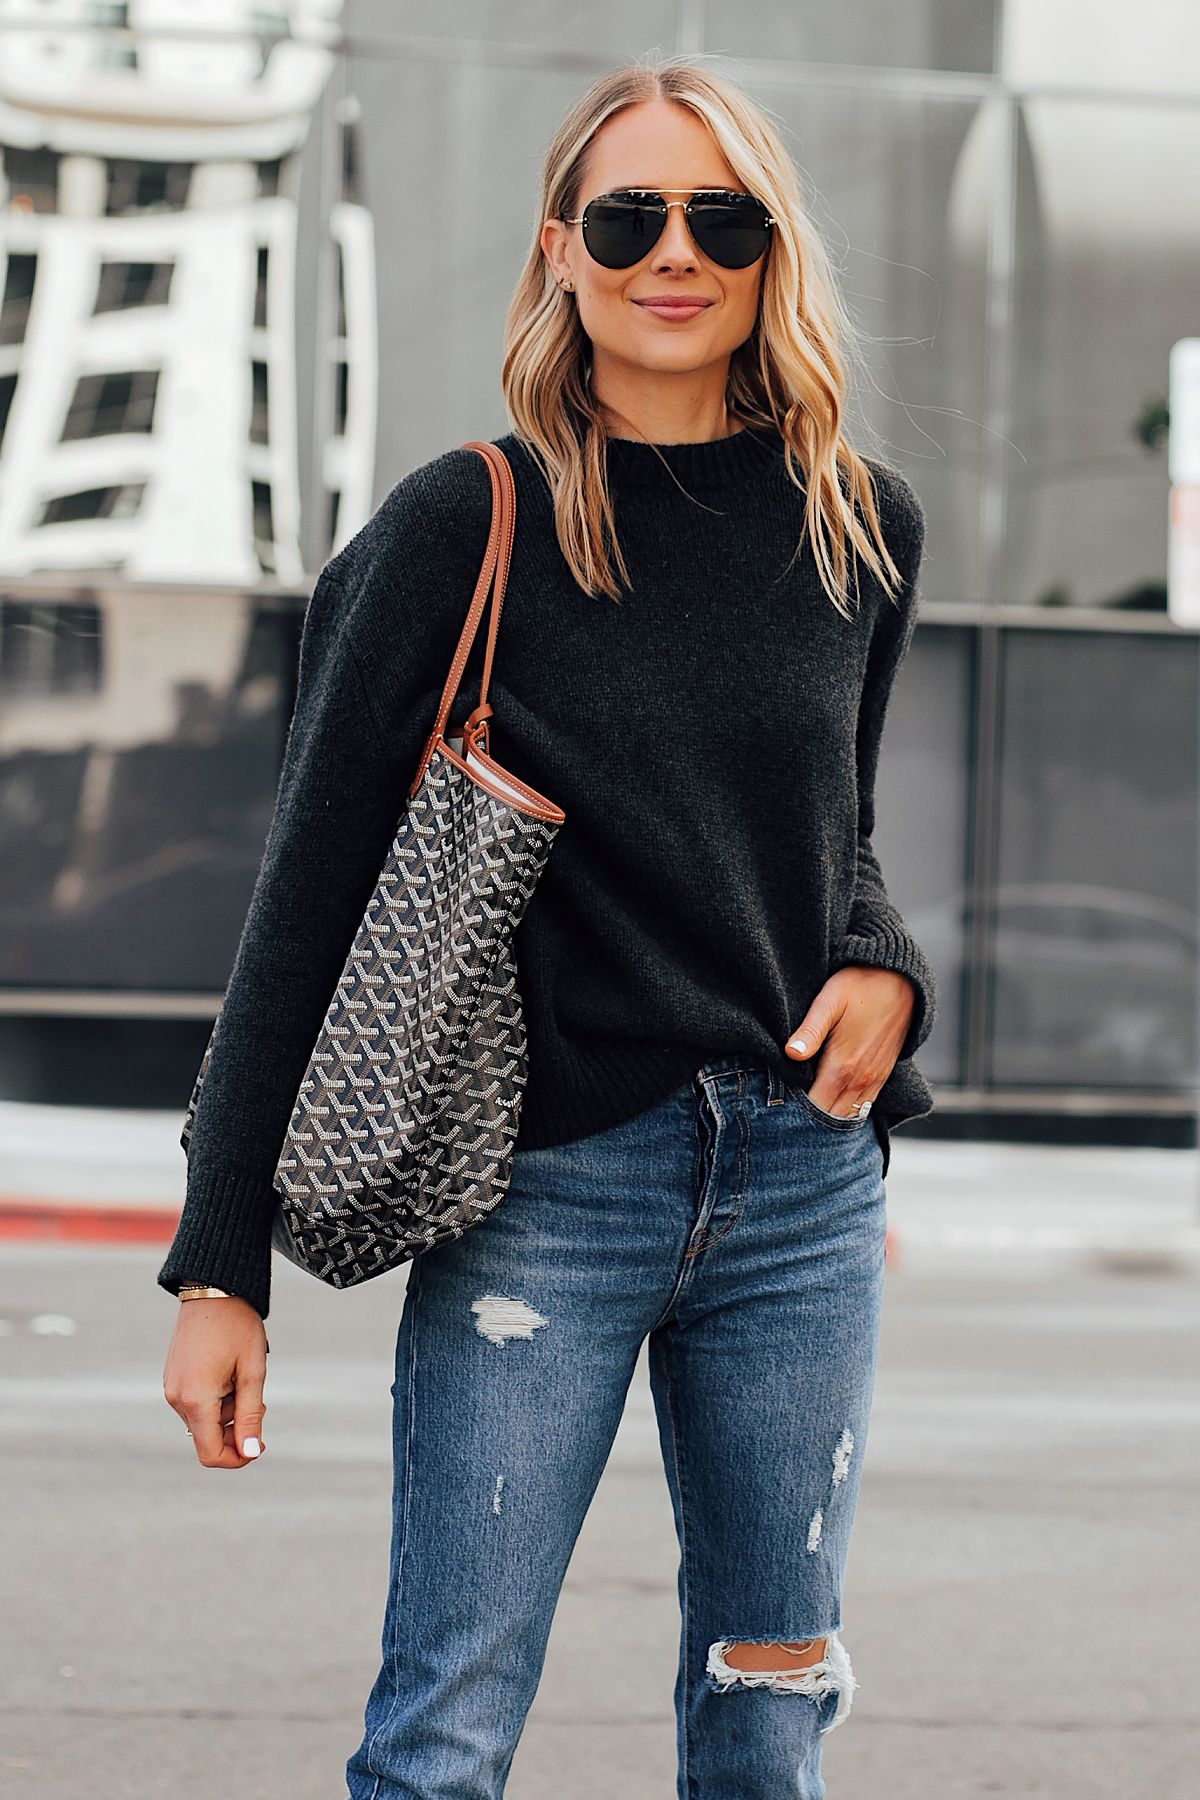 17c3b32ab9a12d Fashion Jackson Wearing Anine Bing Black Sweater Levis Ripped Jeans Goyard  St Louis GM Tote